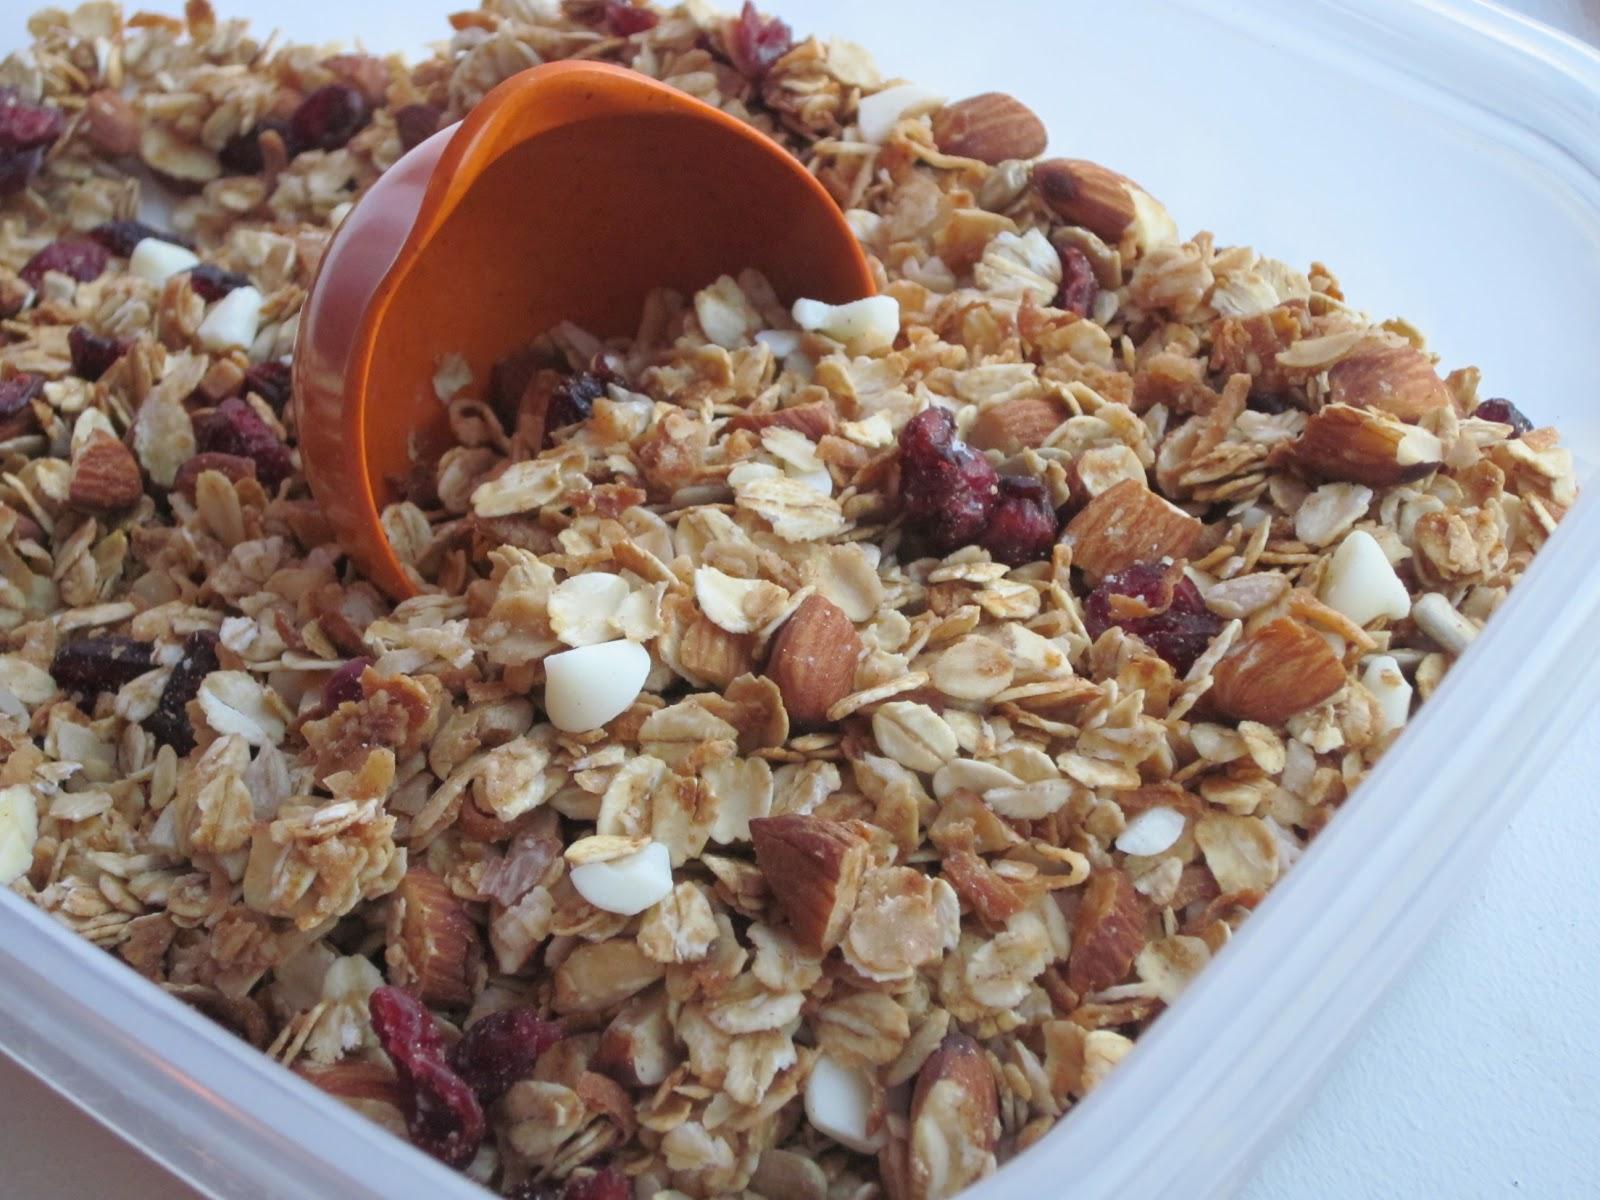 Sweet Luvin' In The Kitchen: Orange Cranberry Granola